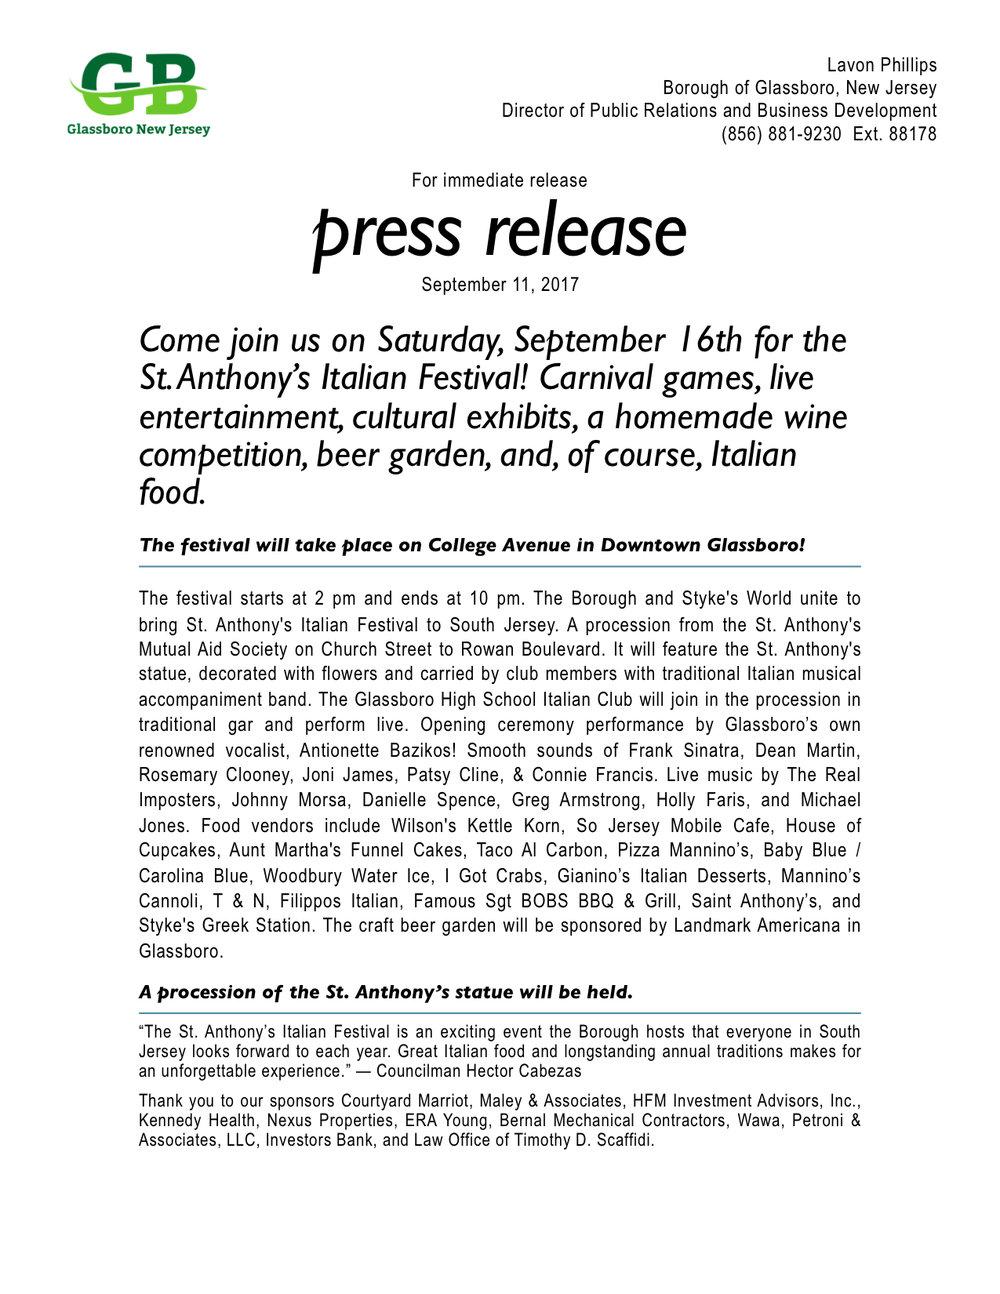 2017 St. Anthony's Italian Festival Press release.jpeg